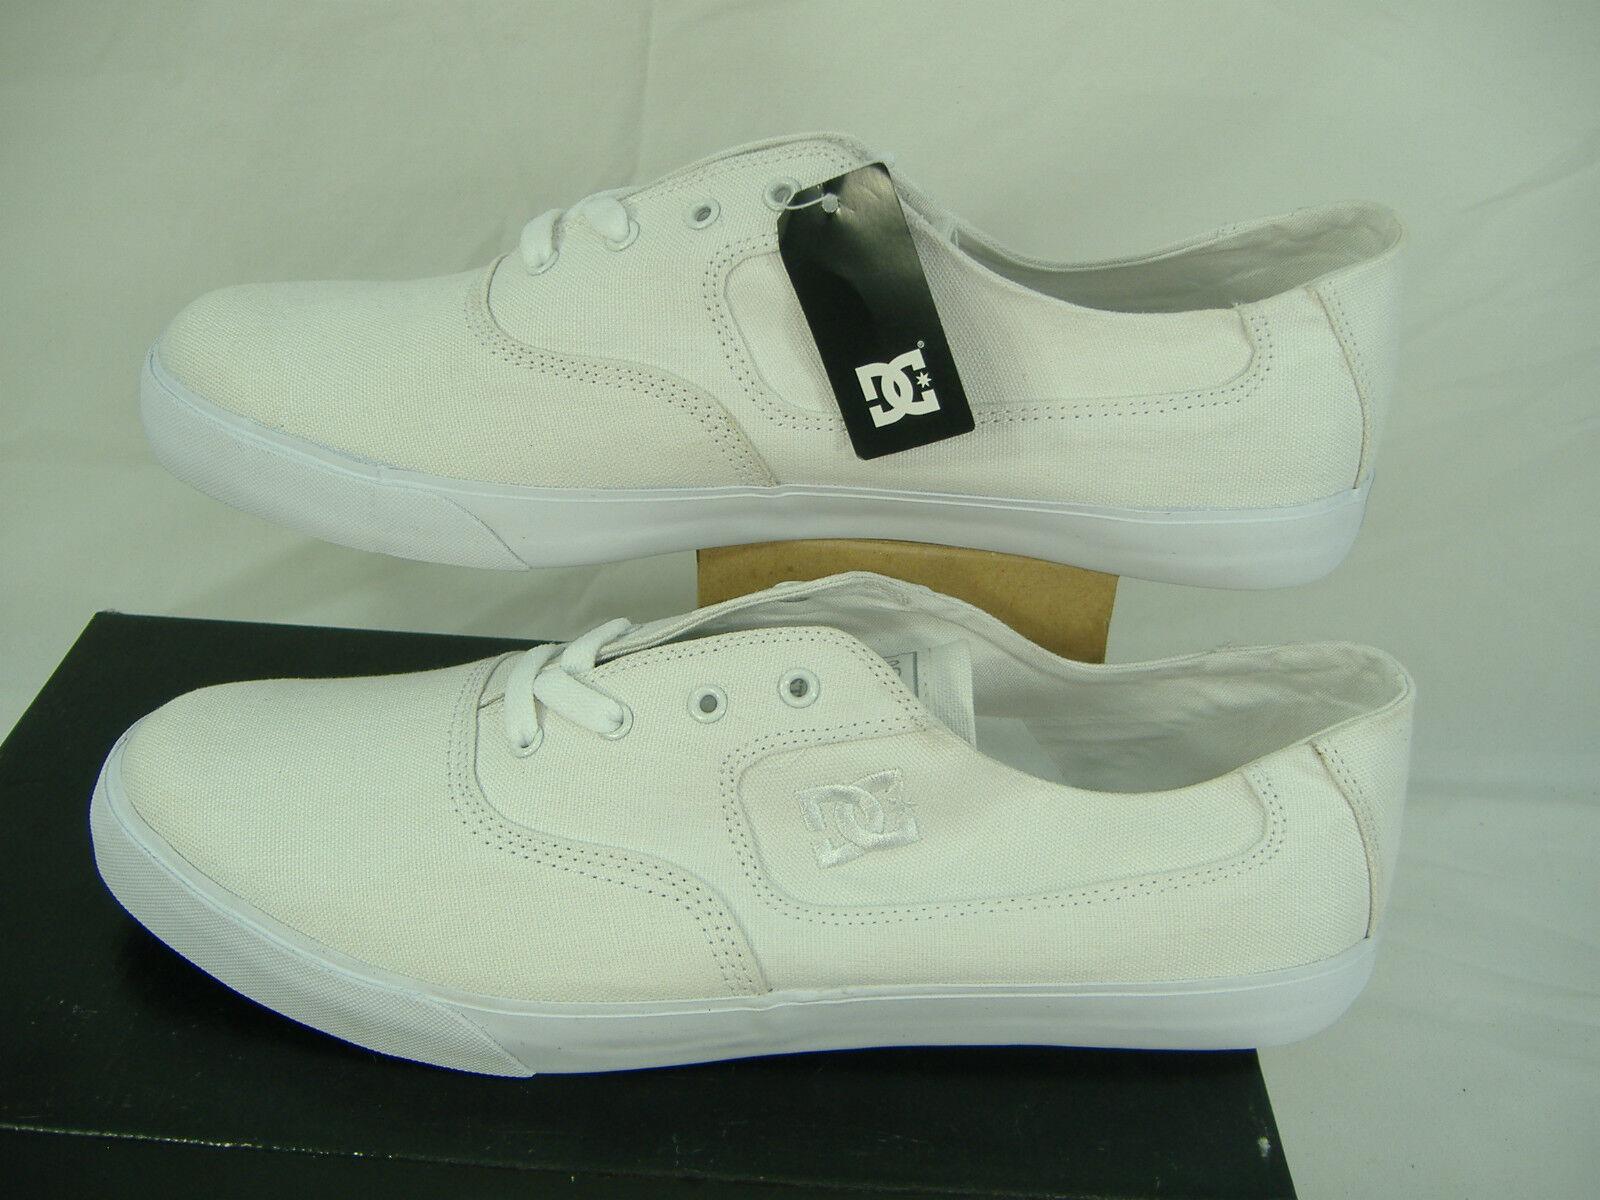 "New Mens 14 DC "" Flash TX "" White Textile Skate Boat Shoes"